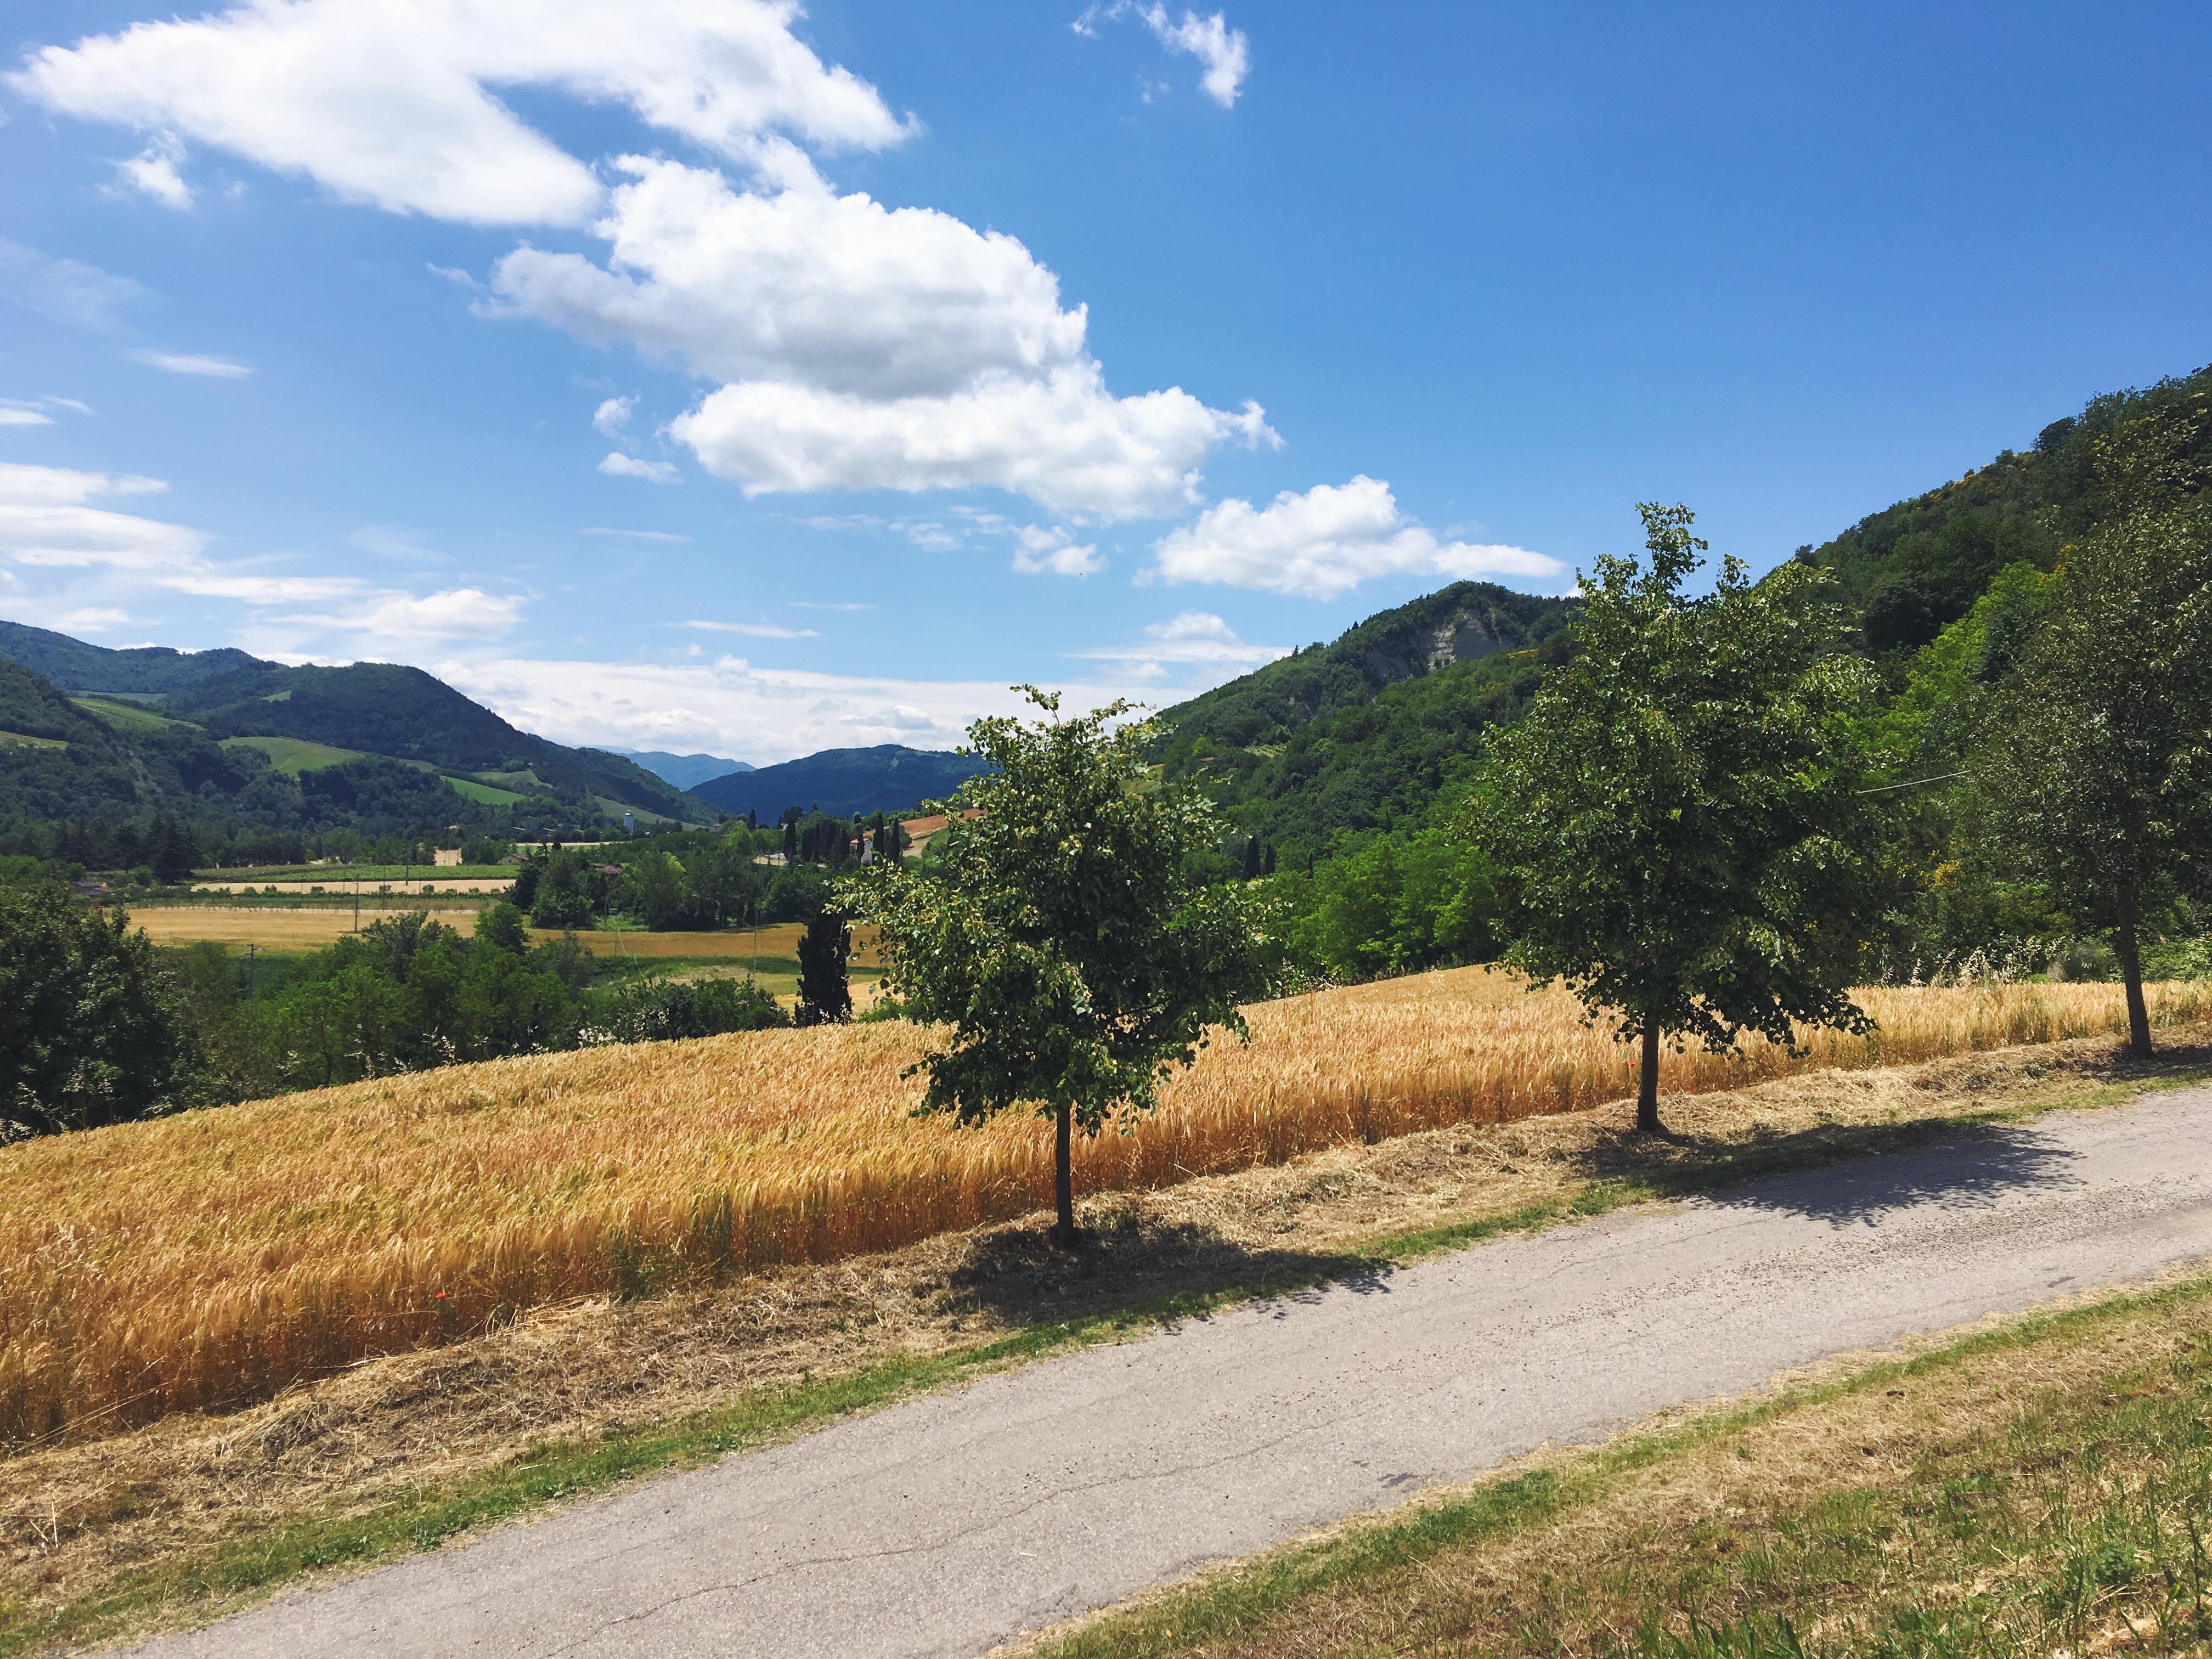 Le colline romagnole